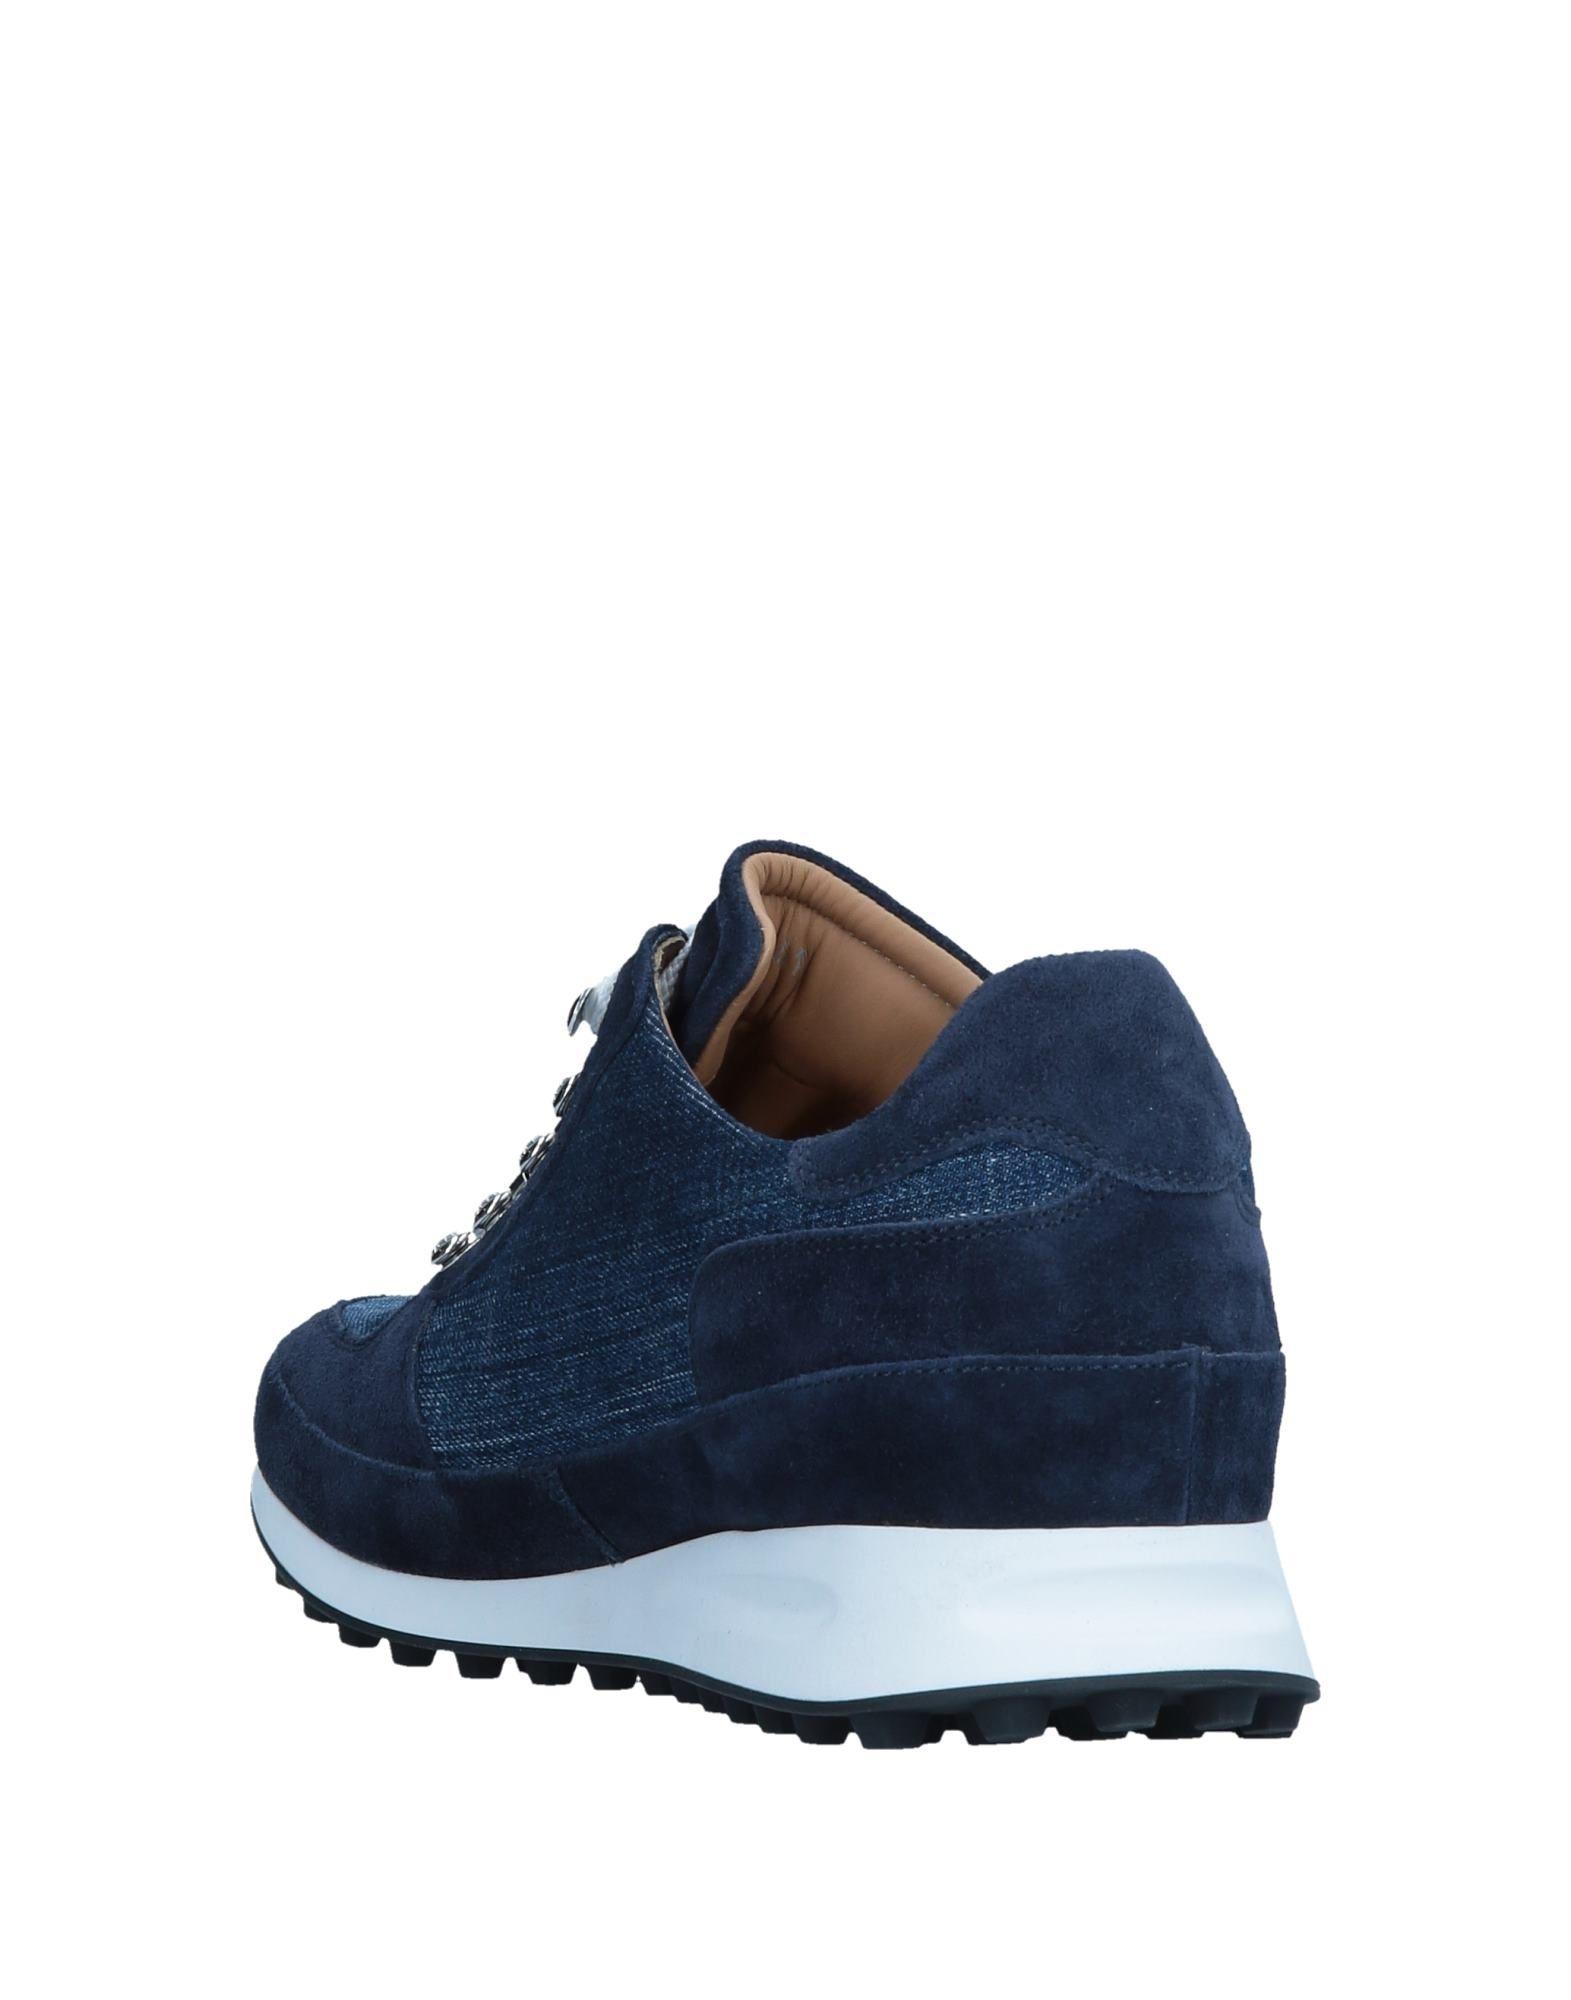 Dsquared2 Gute Sneakers Herren  11558999WP Gute Dsquared2 Qualität beliebte Schuhe 1ccc37